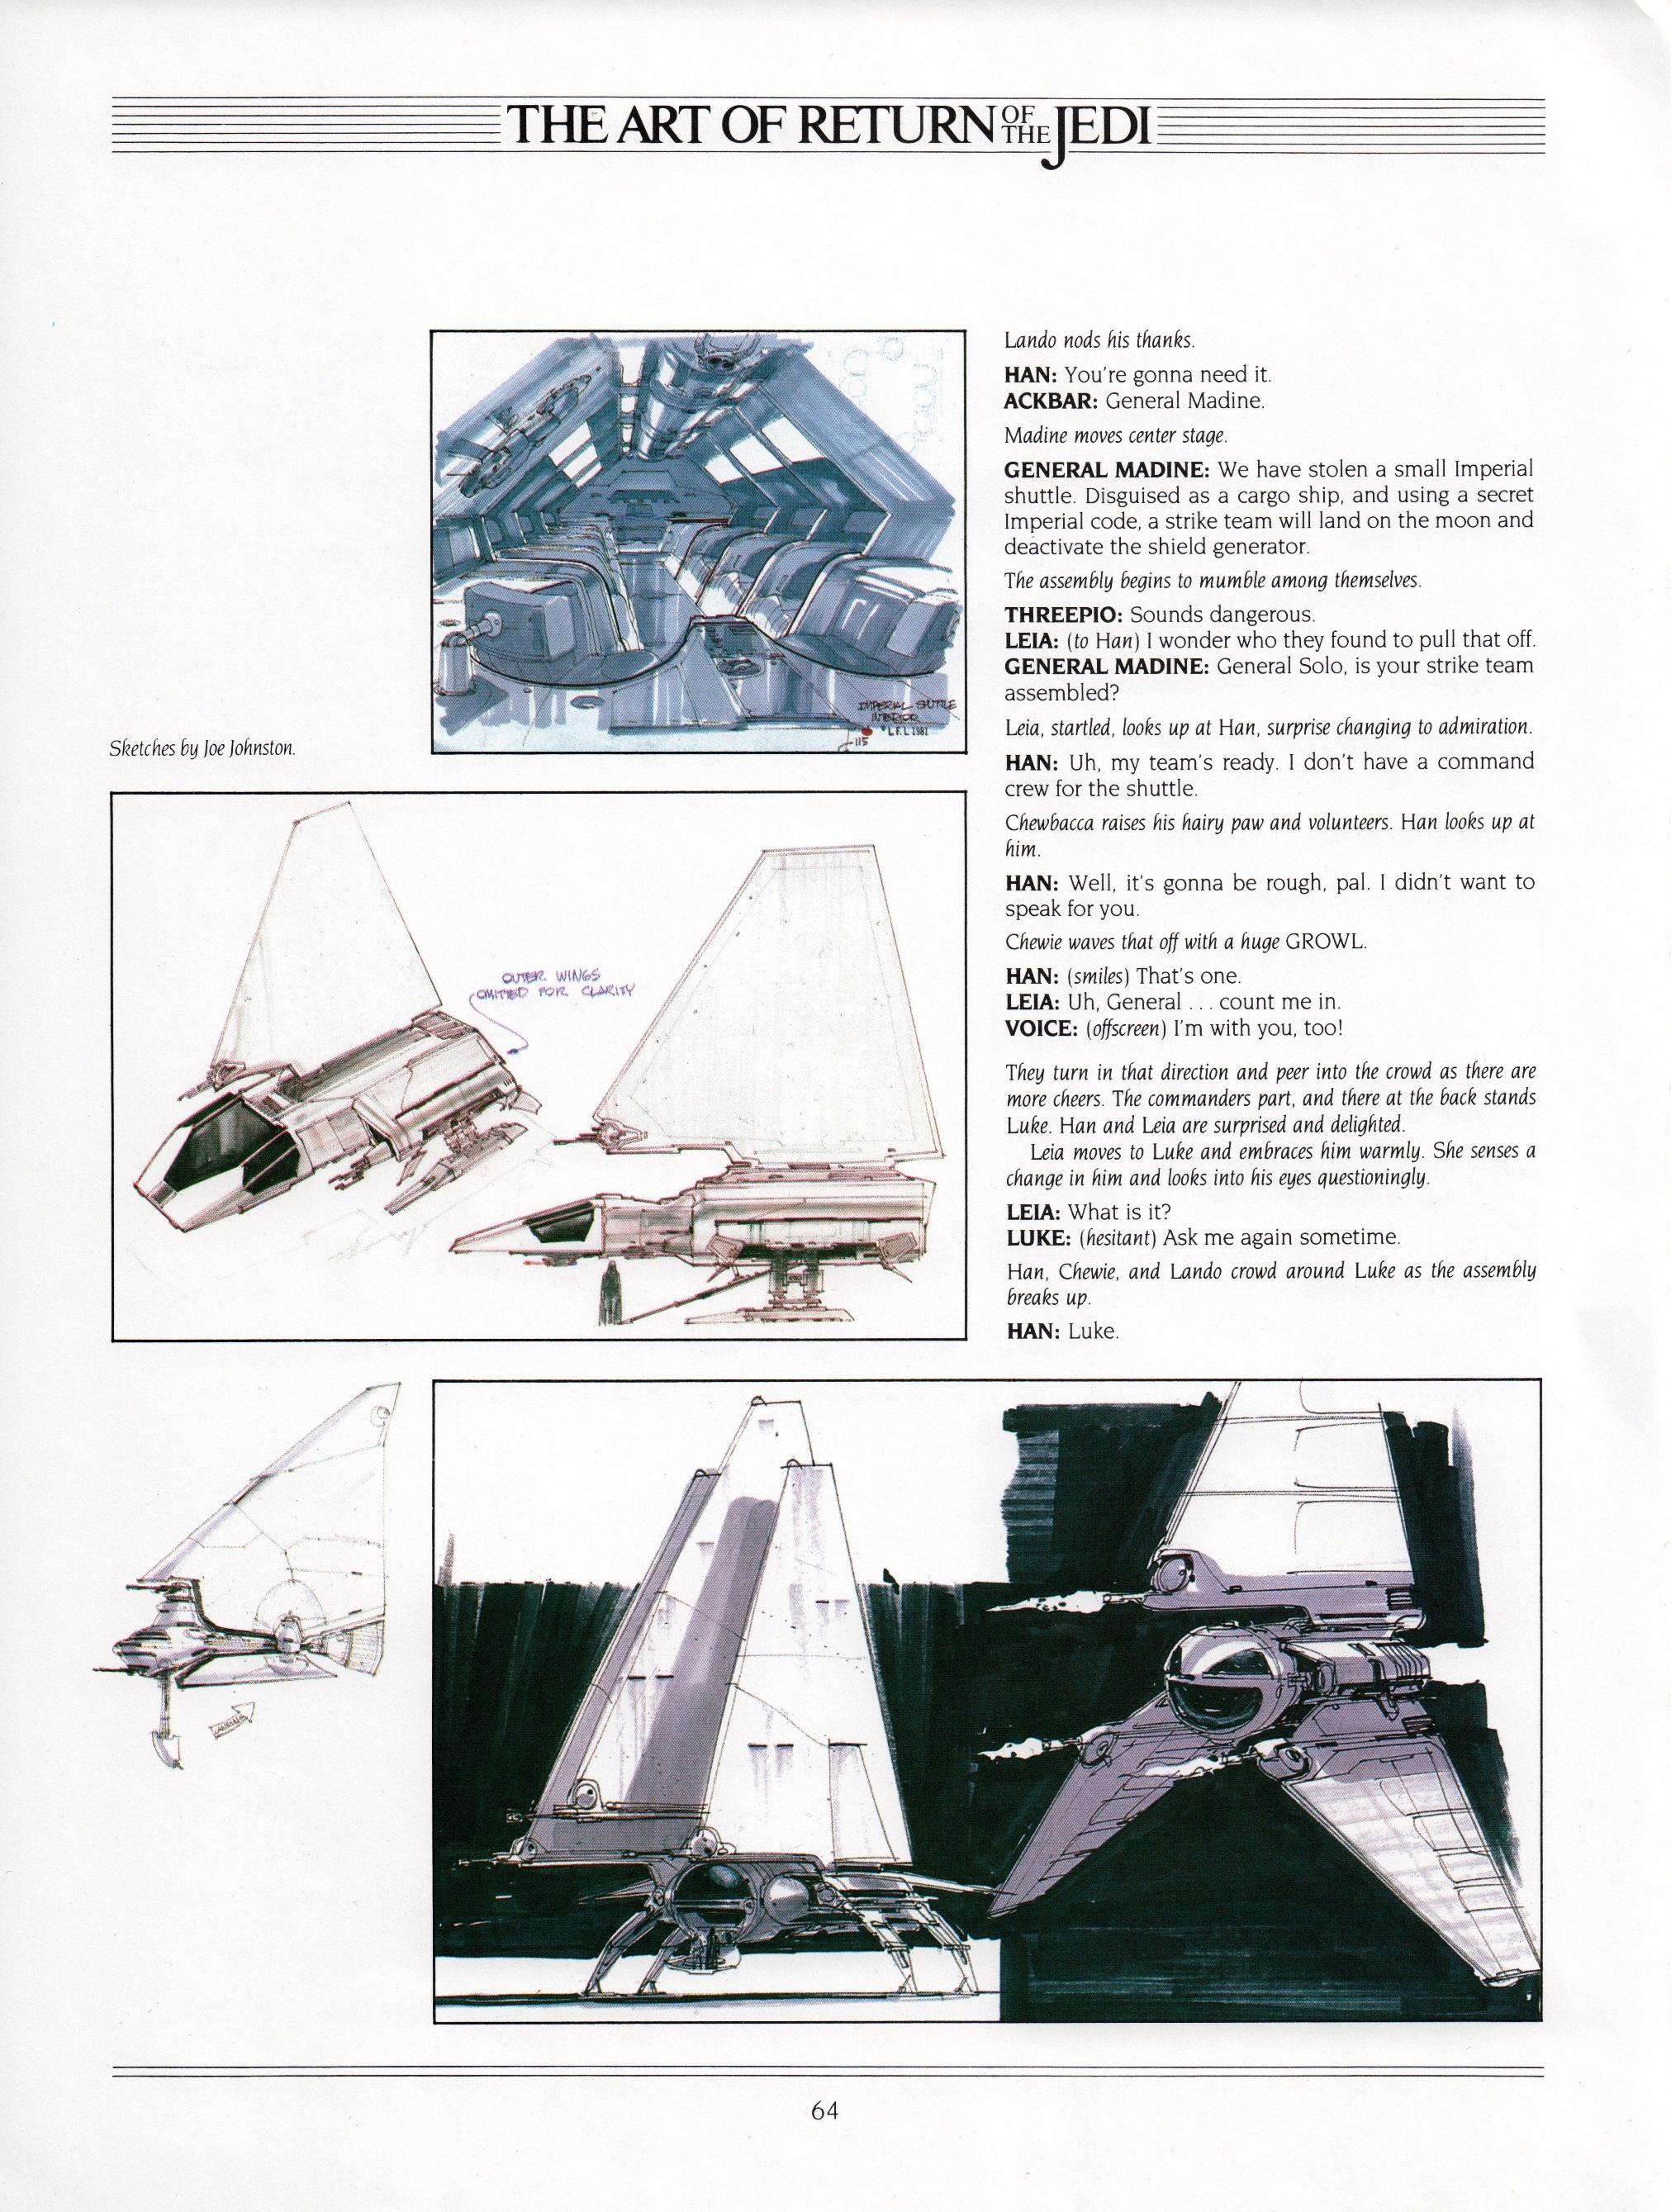 Art of Return of the Jedi (b0bafett_Empire)-p064